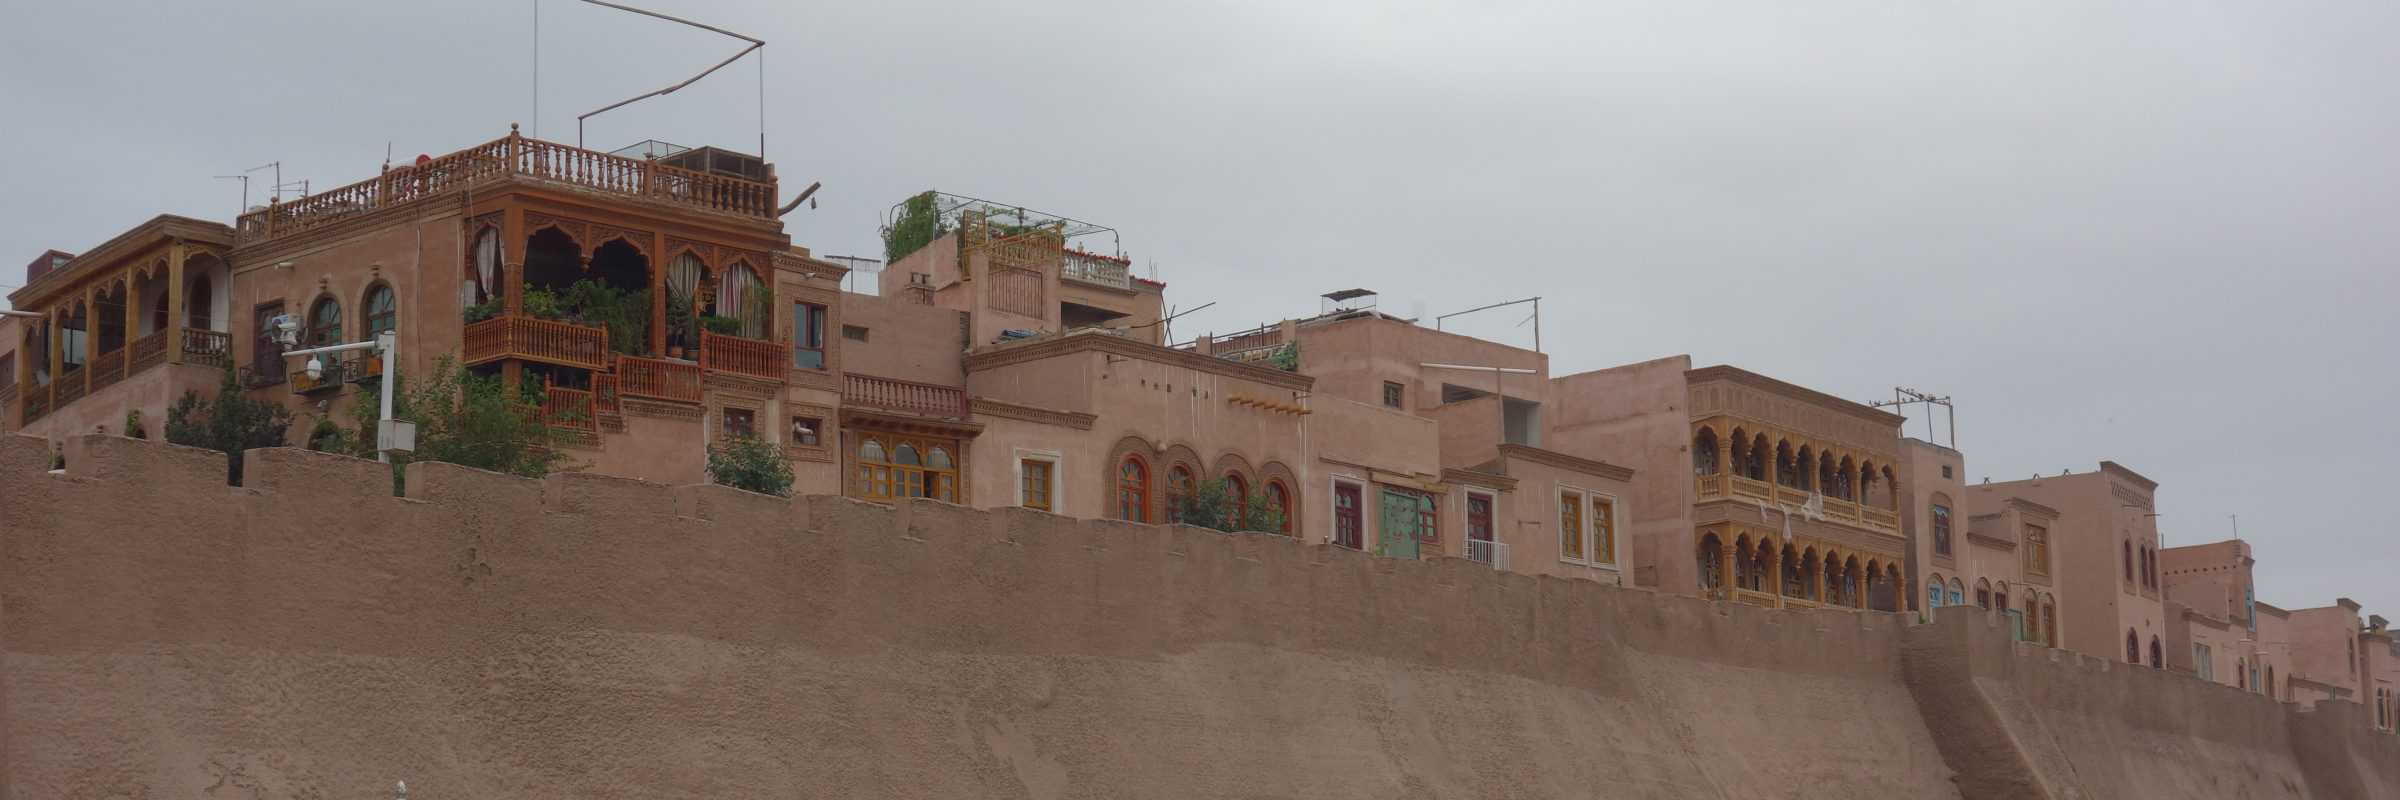 Old Town of Kashgar, China